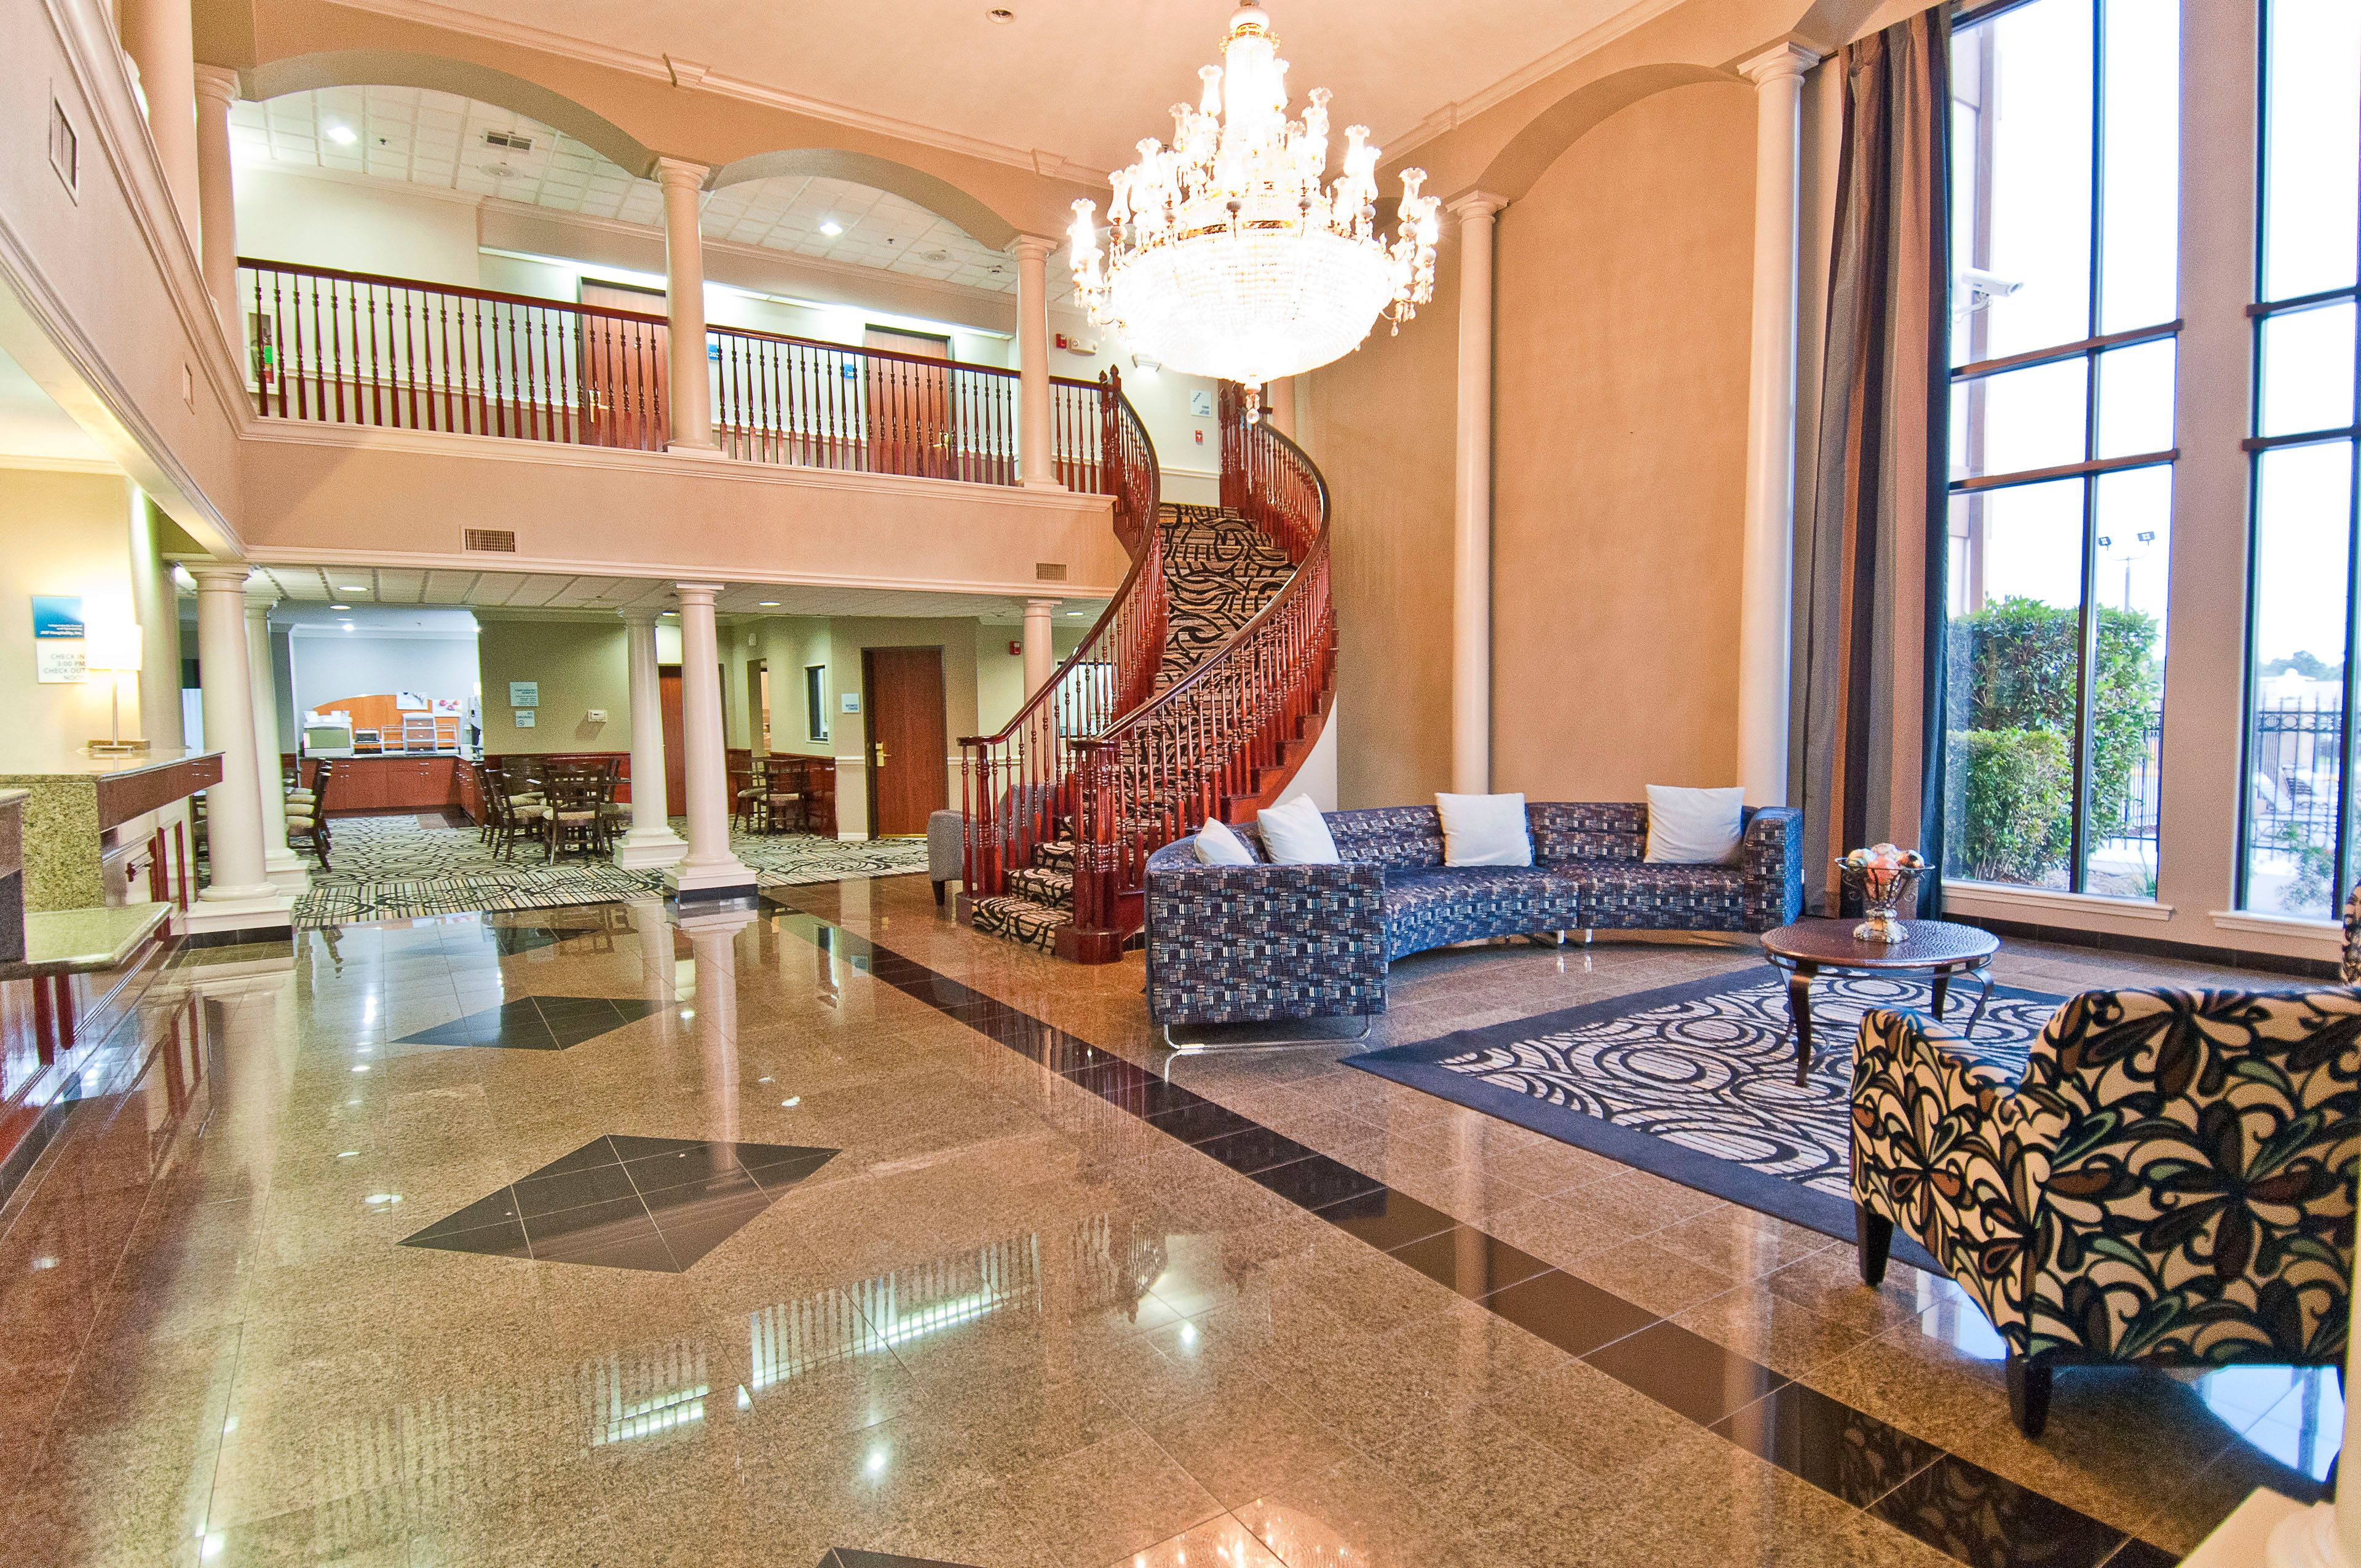 Holiday Inn Express & Suites Lake Charles image 4